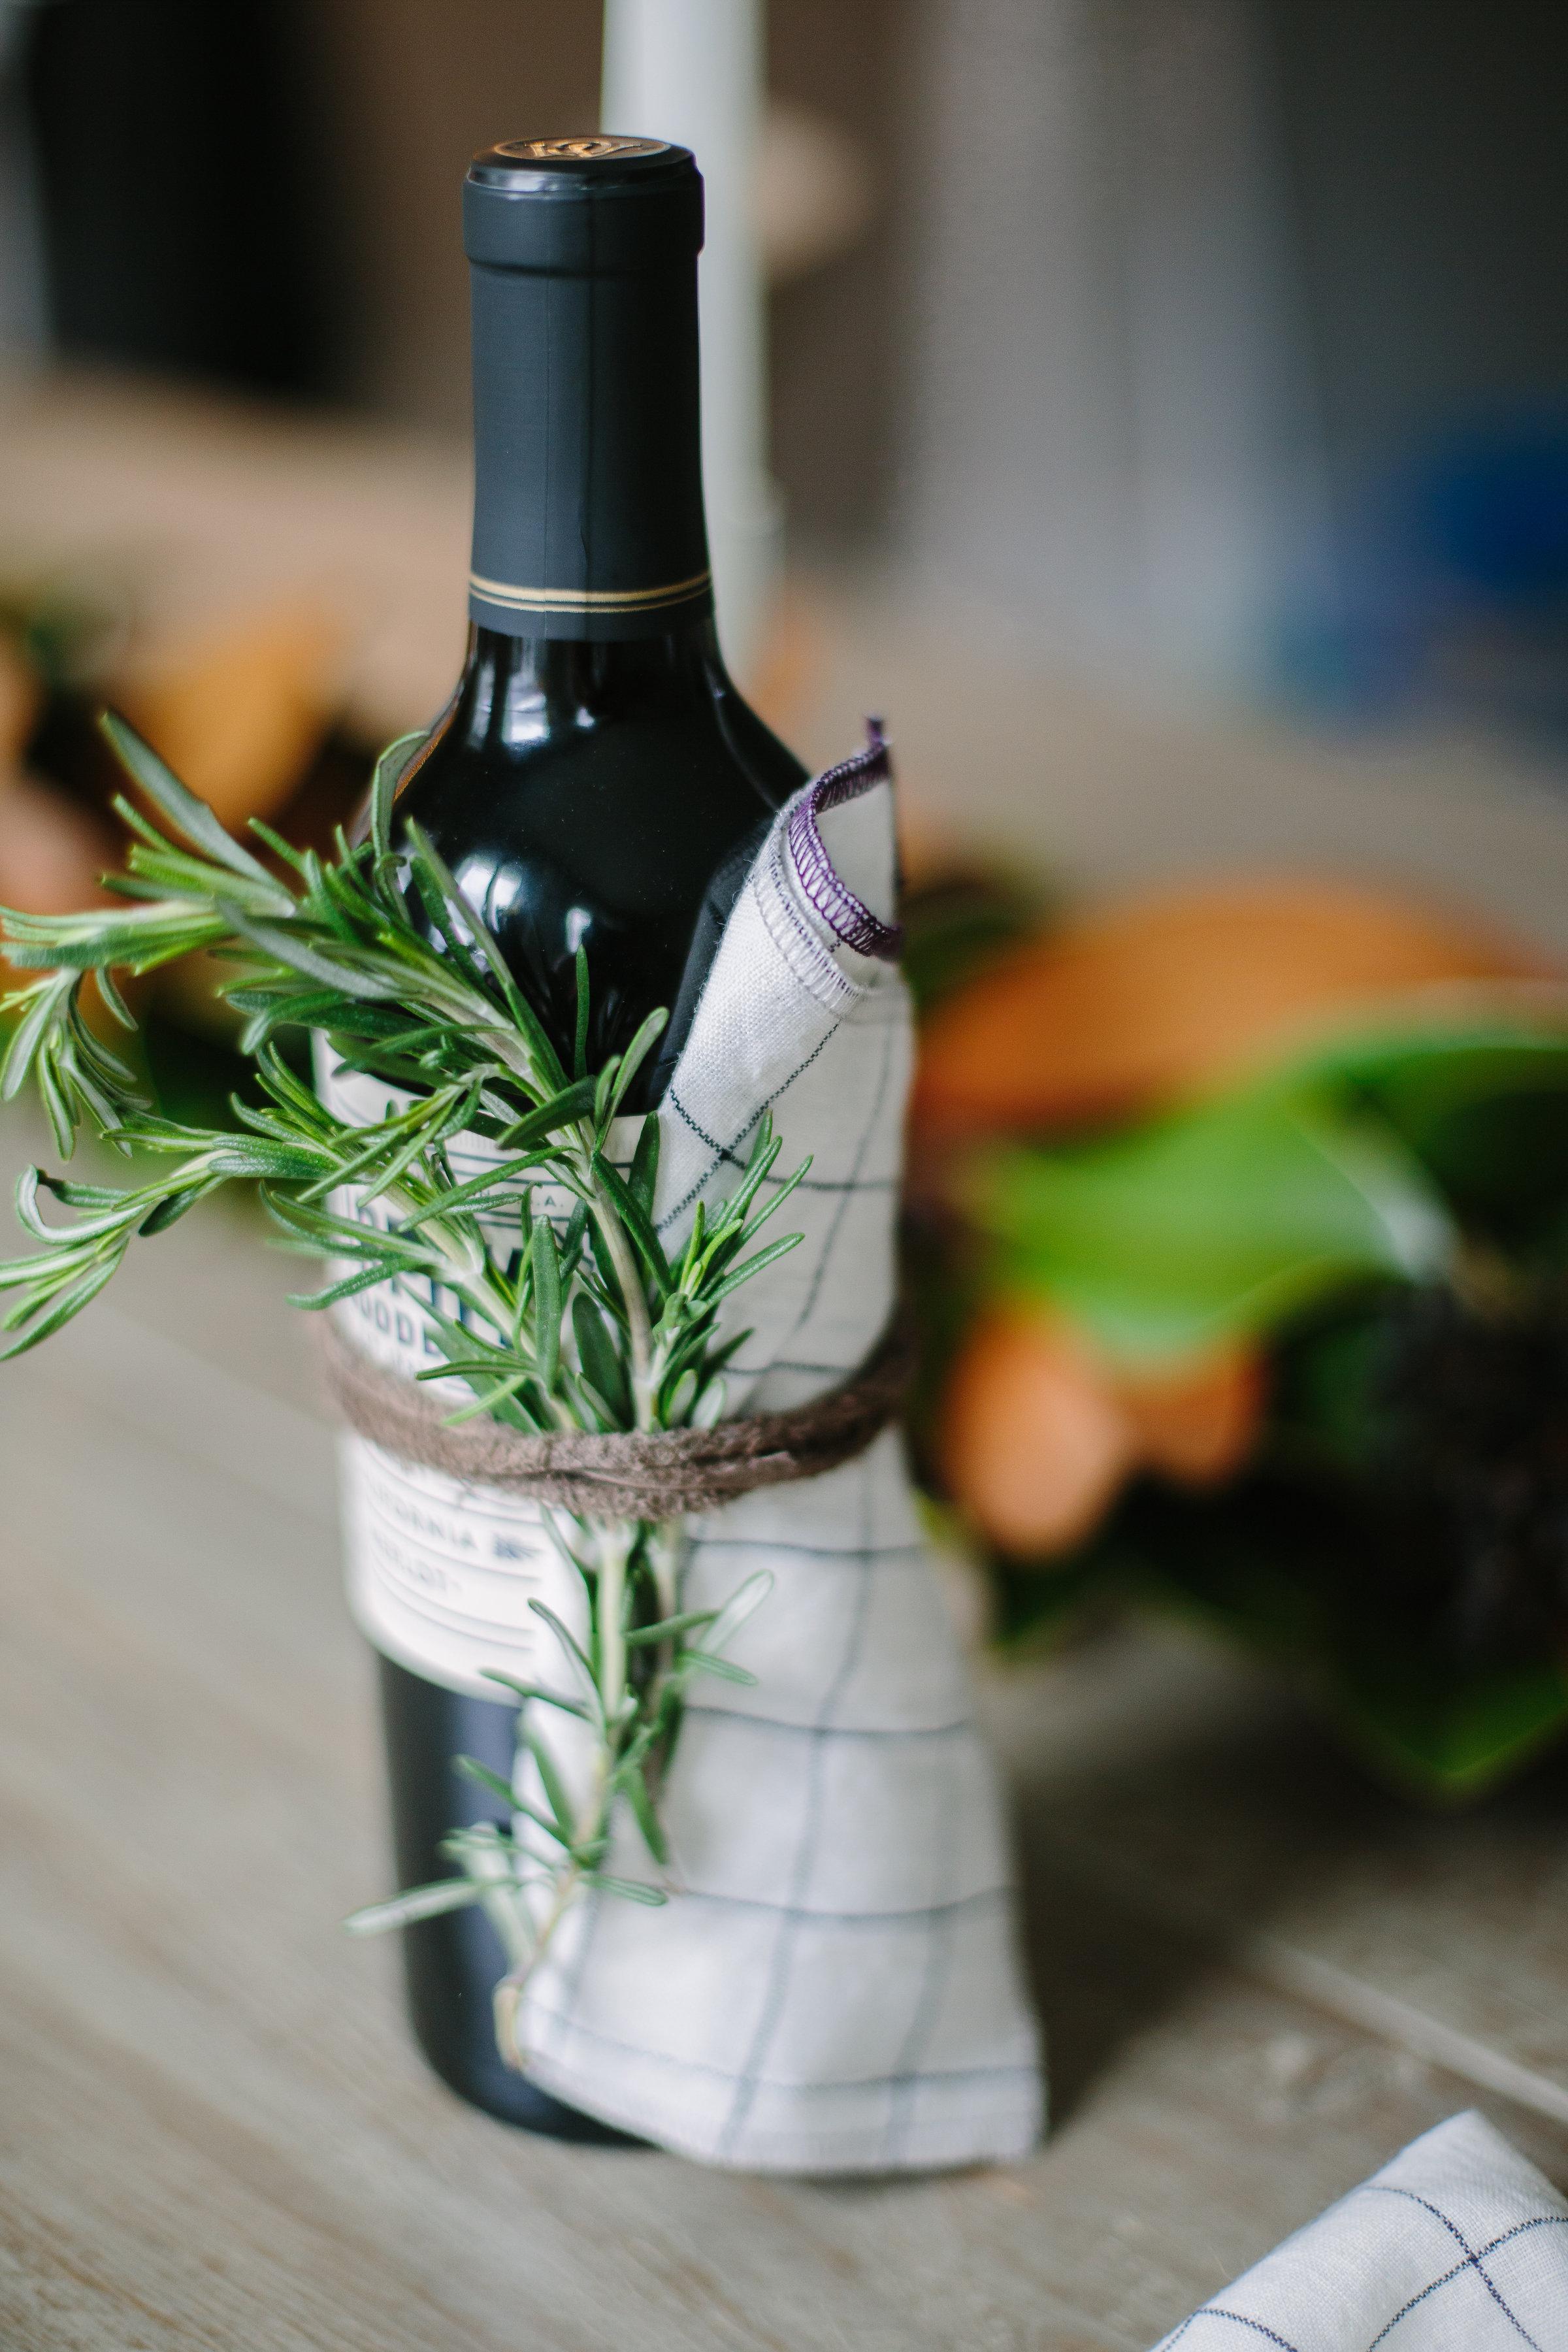 cloth-napkins-the-everyday-co-windowpane-linen-wine-gift-idea-perfect